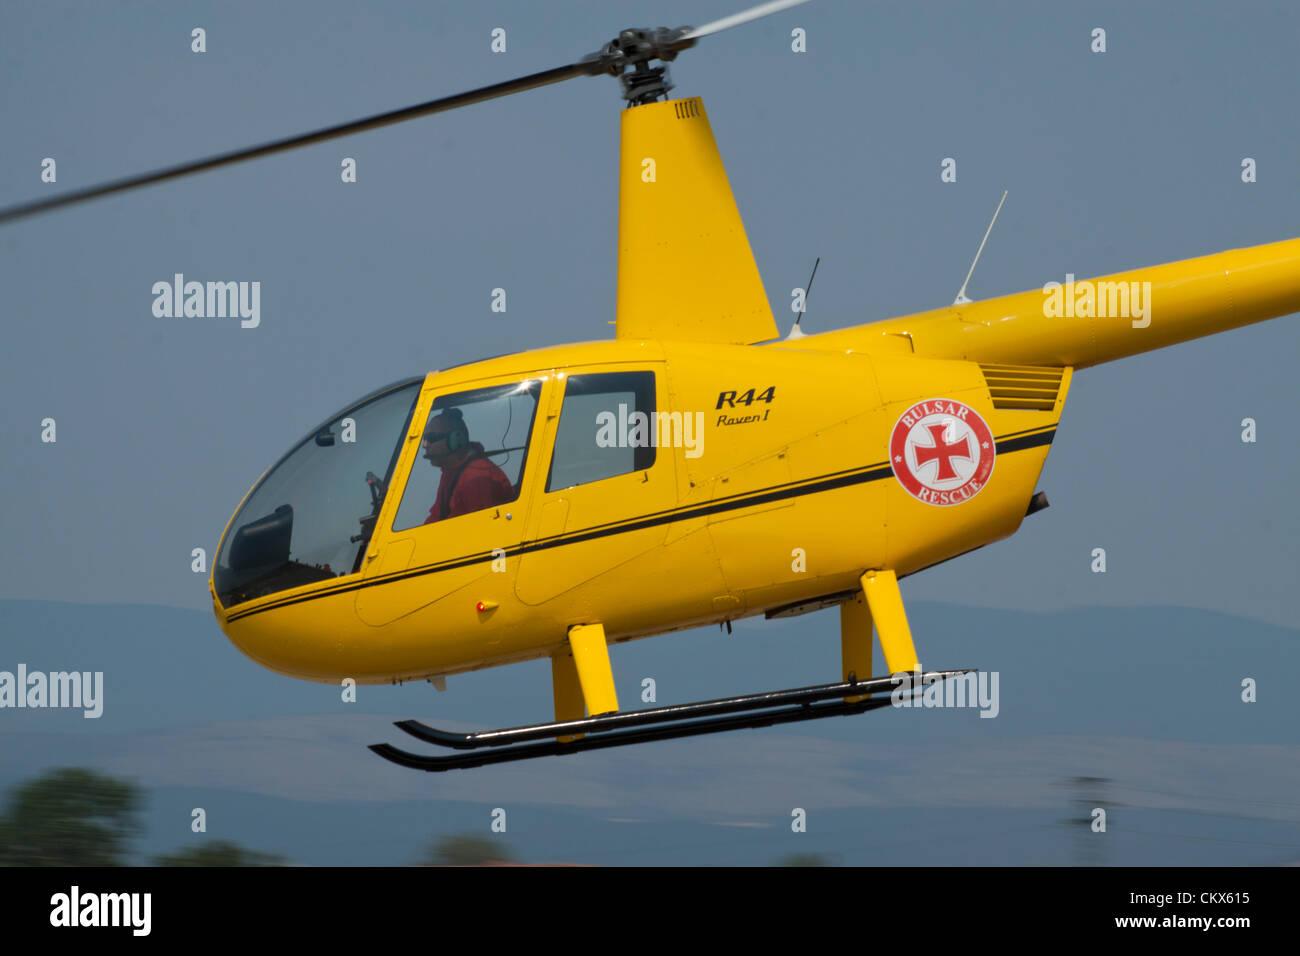 Km H Elicottero : Lesnovo bulgaria agosto robinson r elicottero del